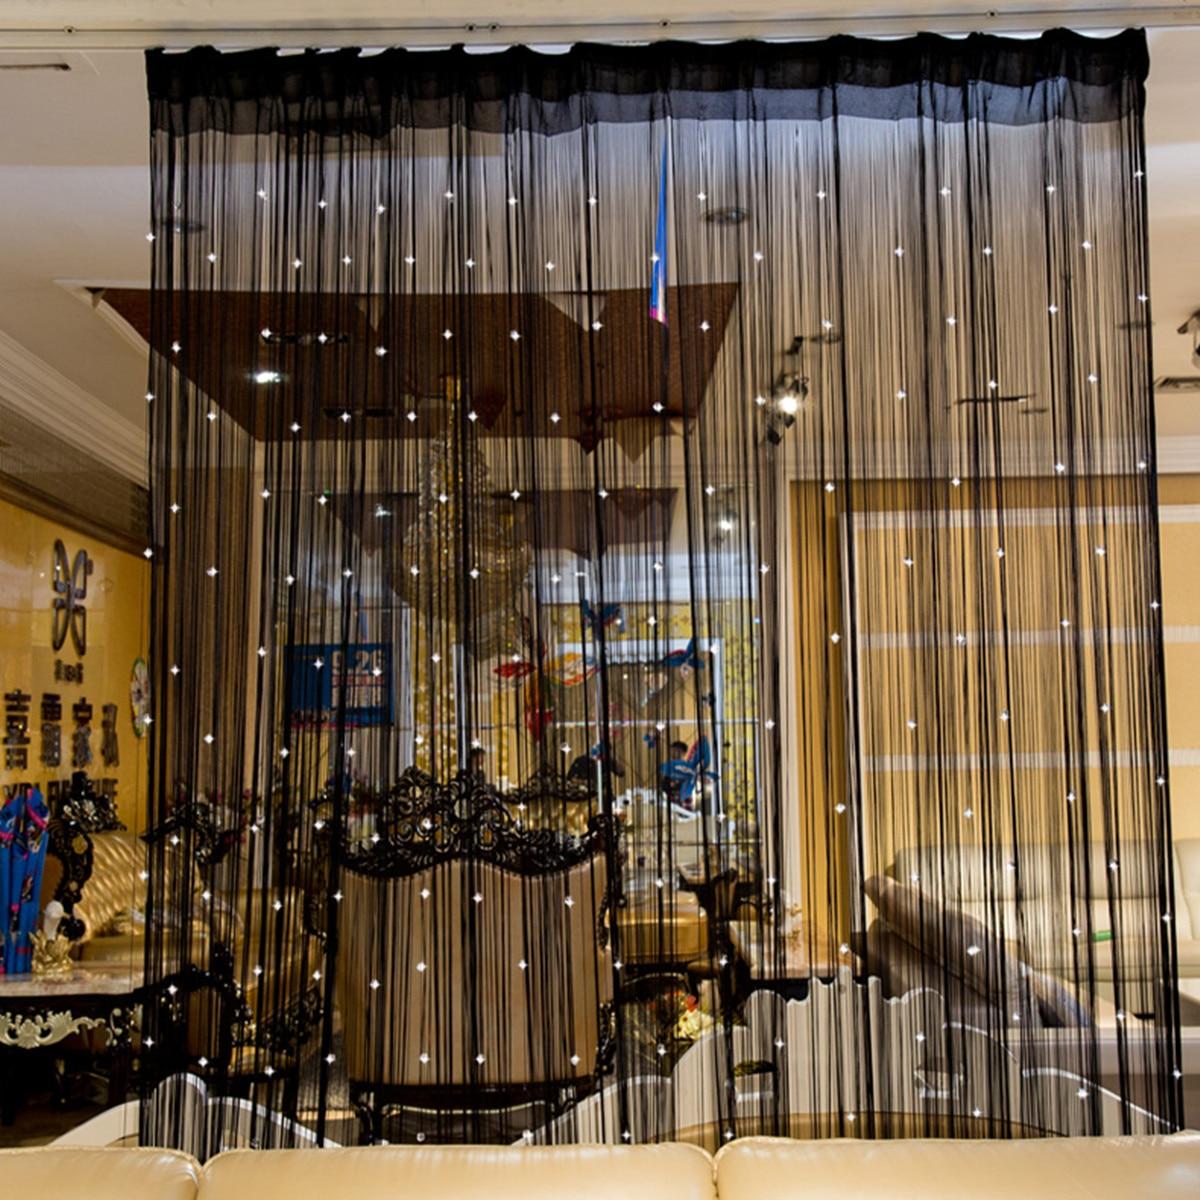 Beaded Curtain String Door Window Room Panel Glitter Crystal Ball Tassel String Line Door Window Curtain Room Divider Decorative